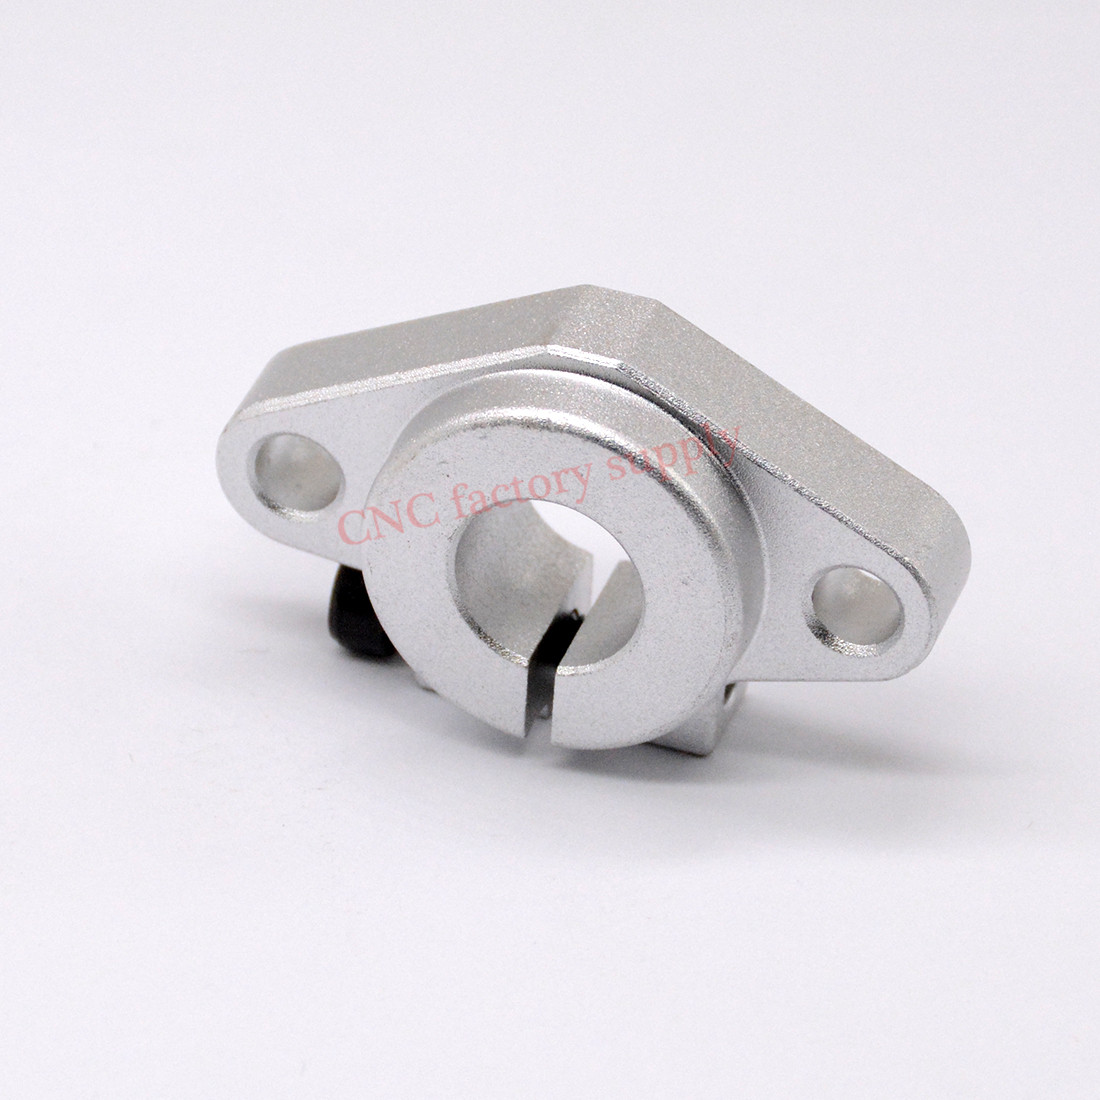 Hot sale 1pc  SHF30 30mm linear rail shaft support XYZ Table CNC Router hot sale 1pc lm12uu linear bushing 12mm cnc linear bearings